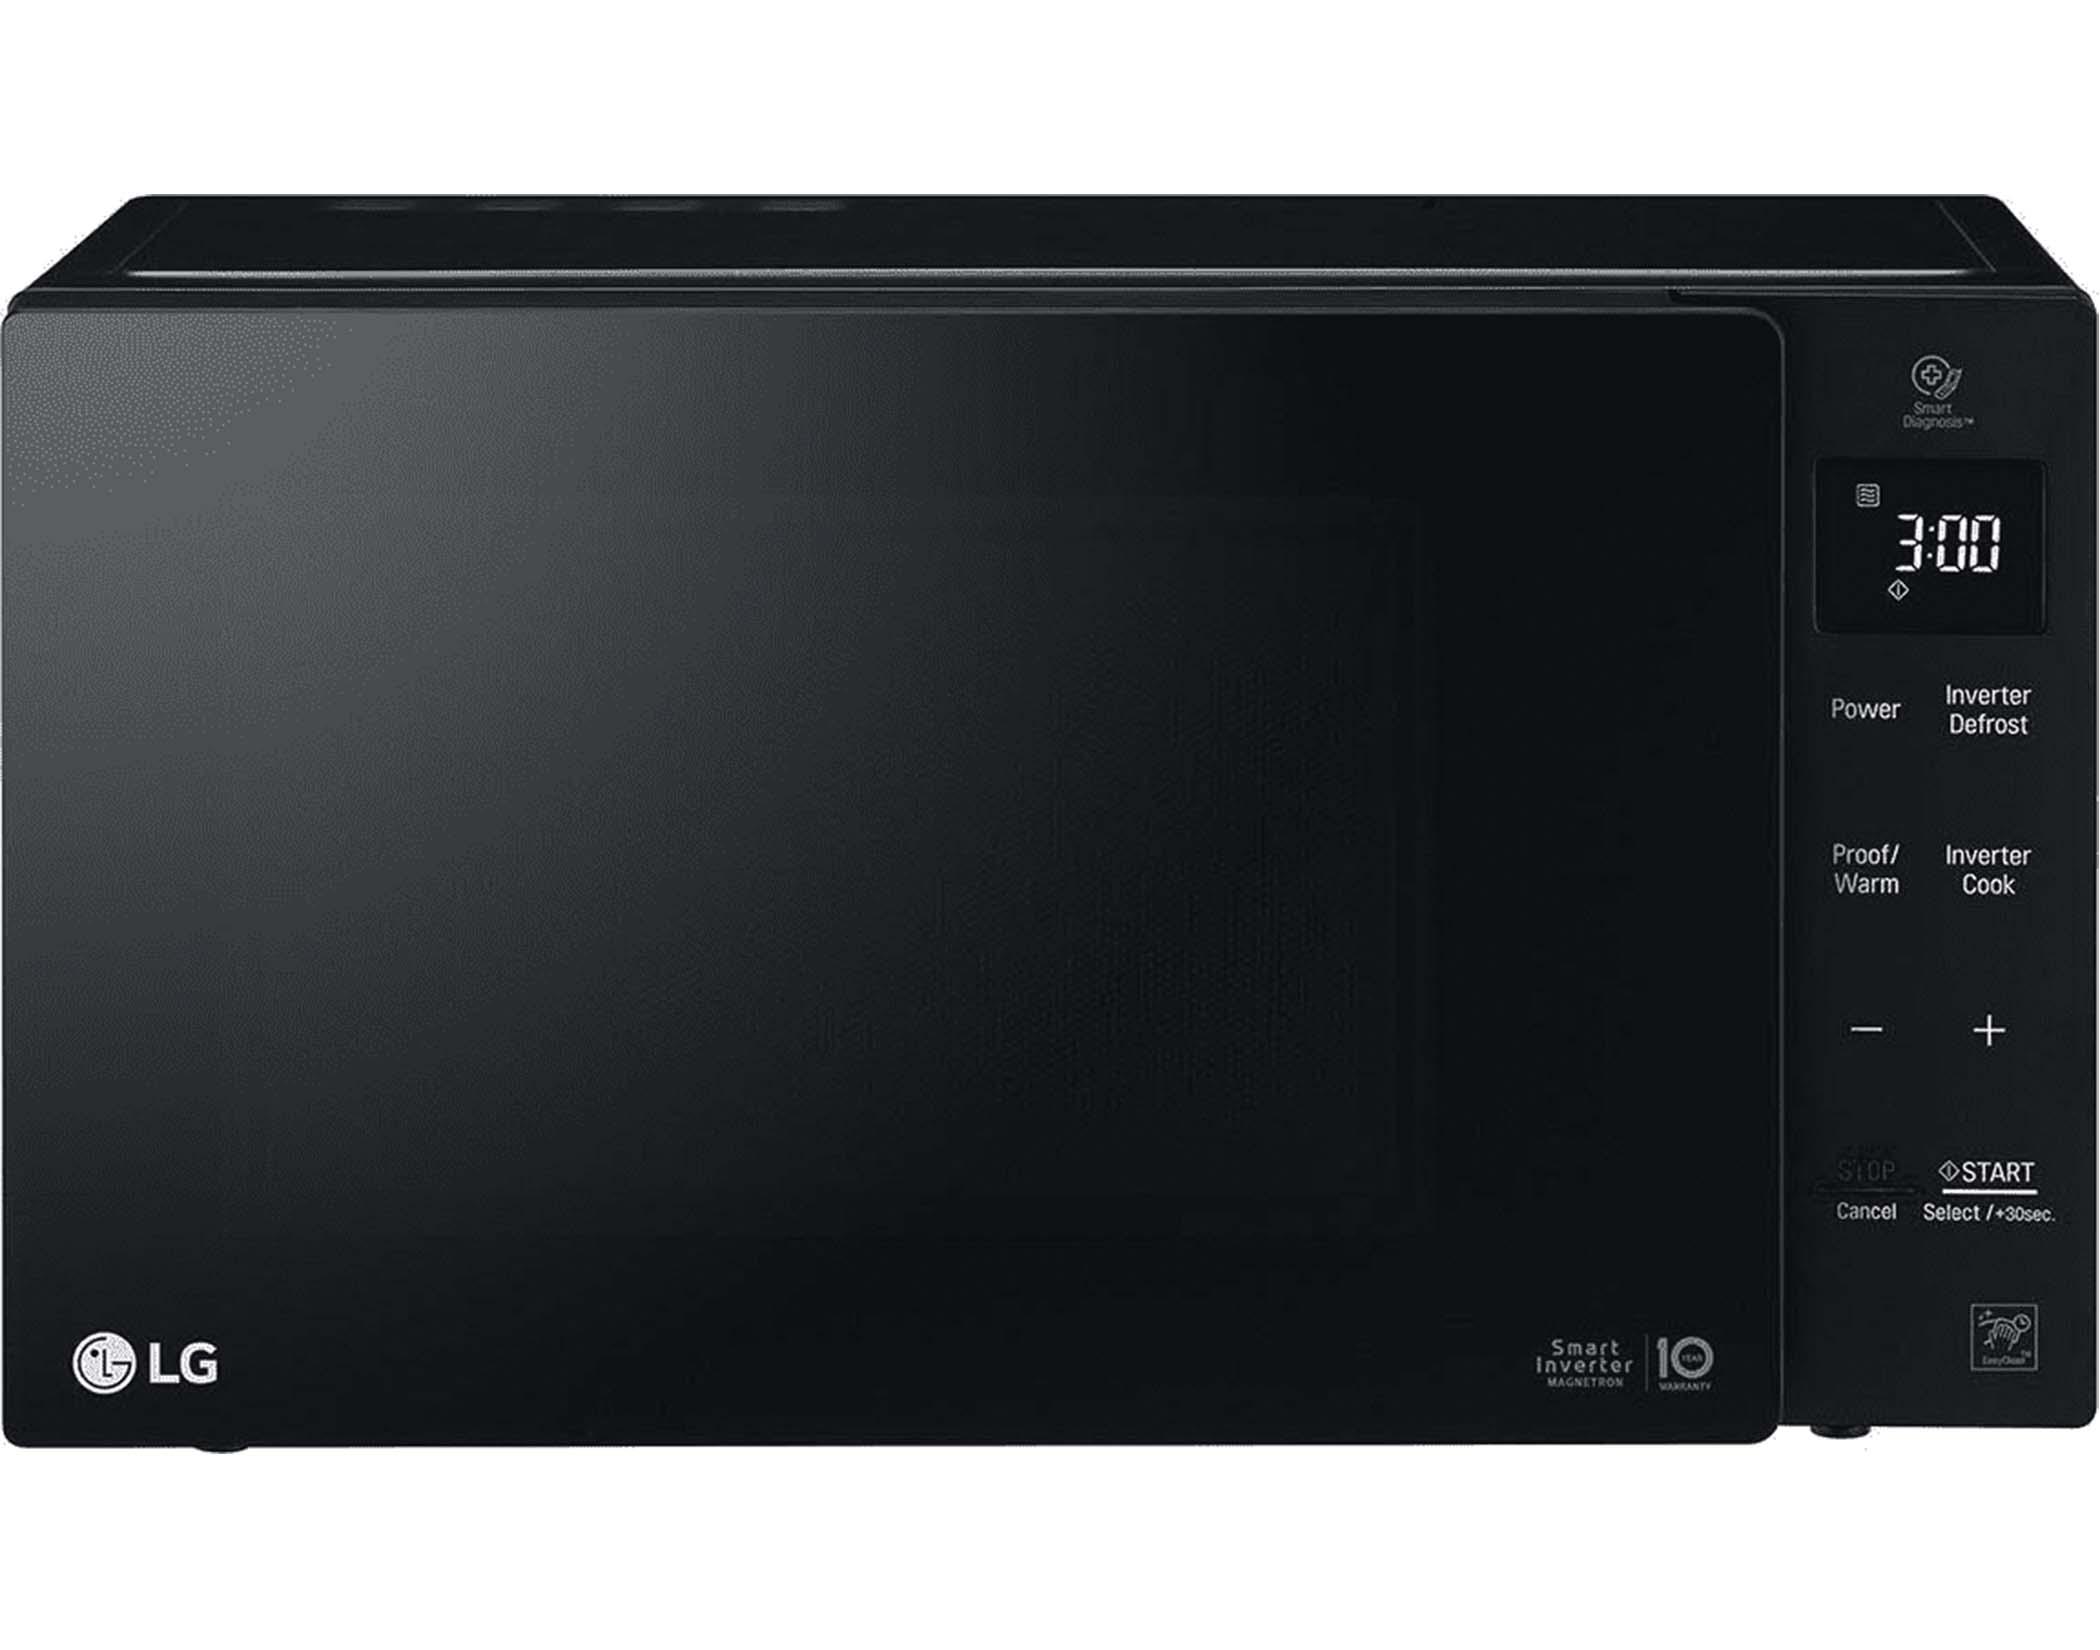 LG MS4236DB 42L Neochef Smart Inverter Microwave Oven